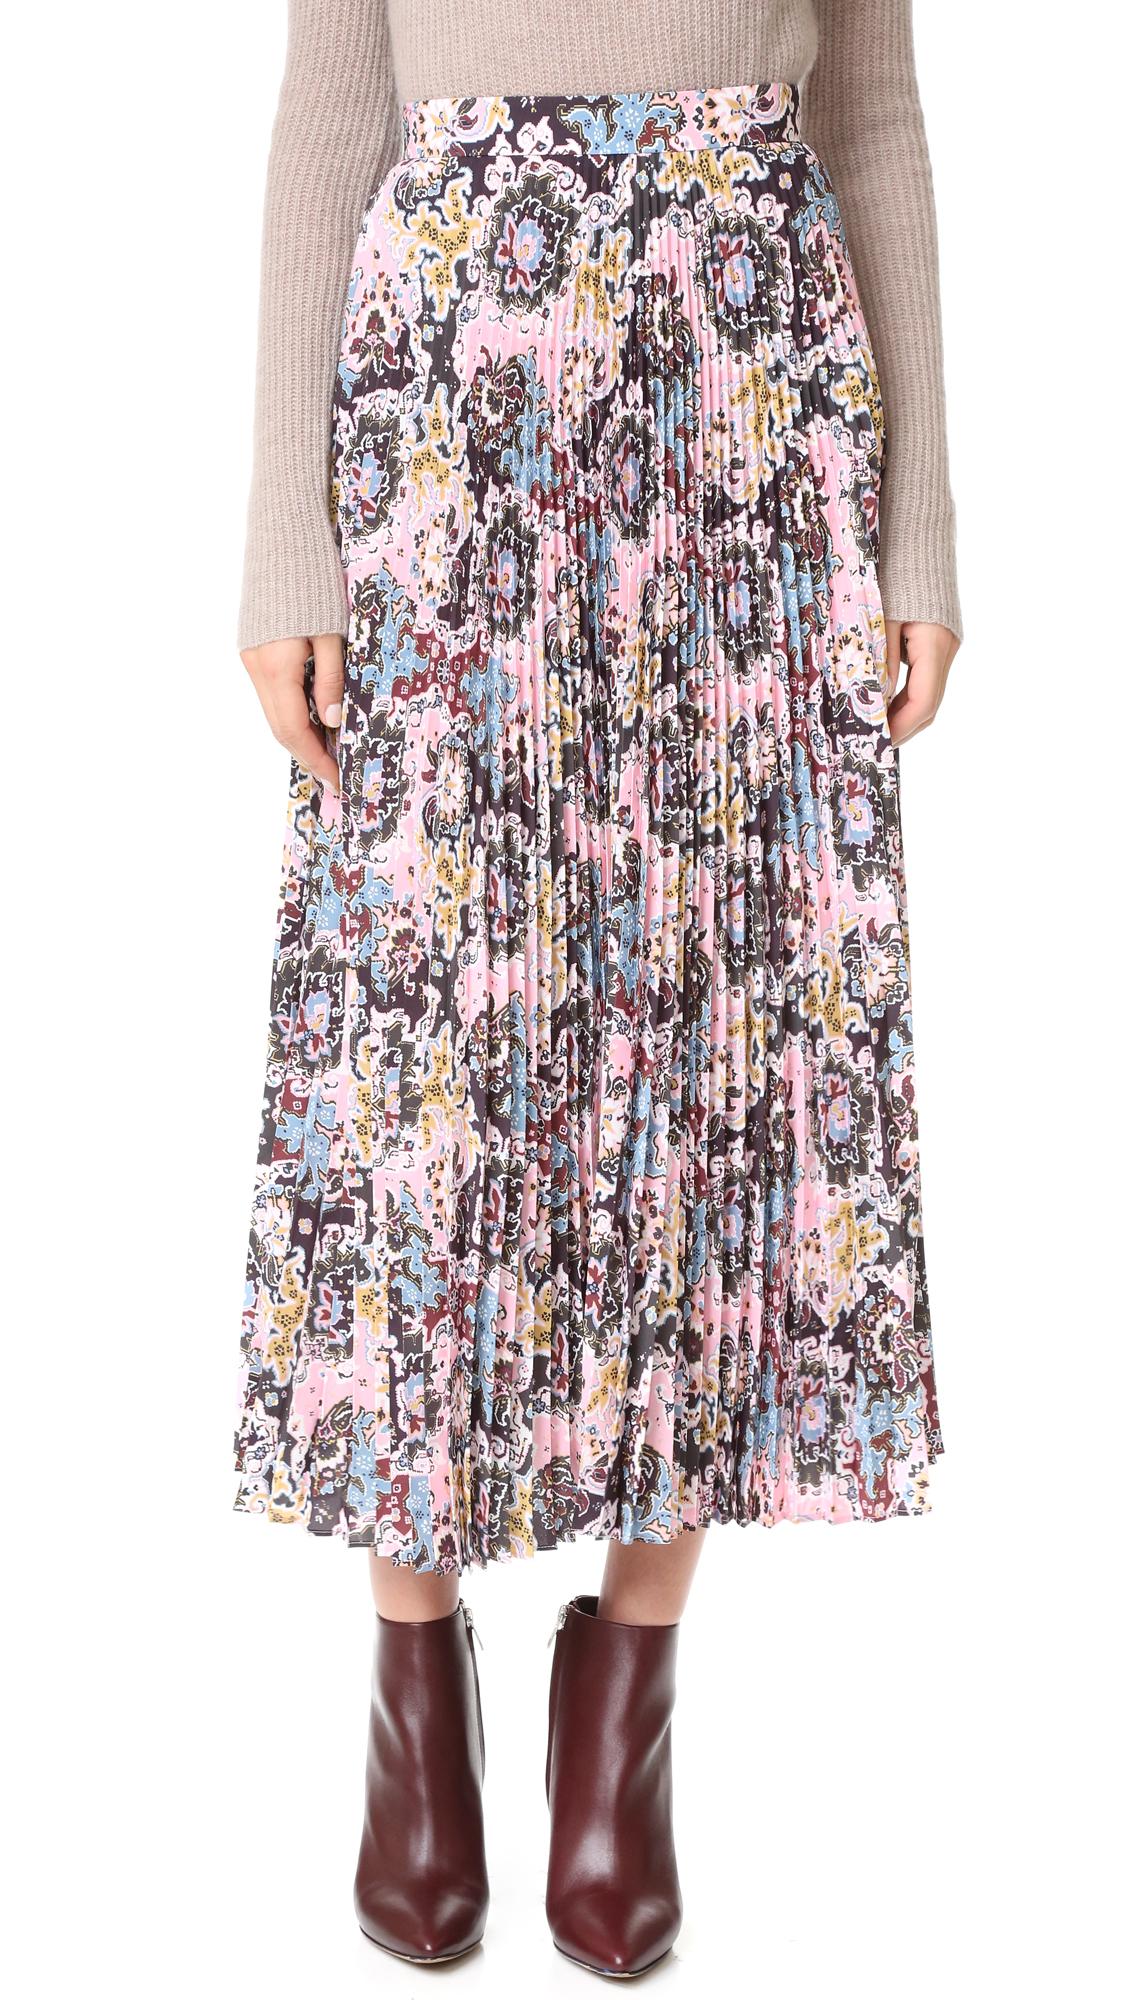 A.L.C. Williams Skirt - Pink/Blue/Mustard at Shopbop